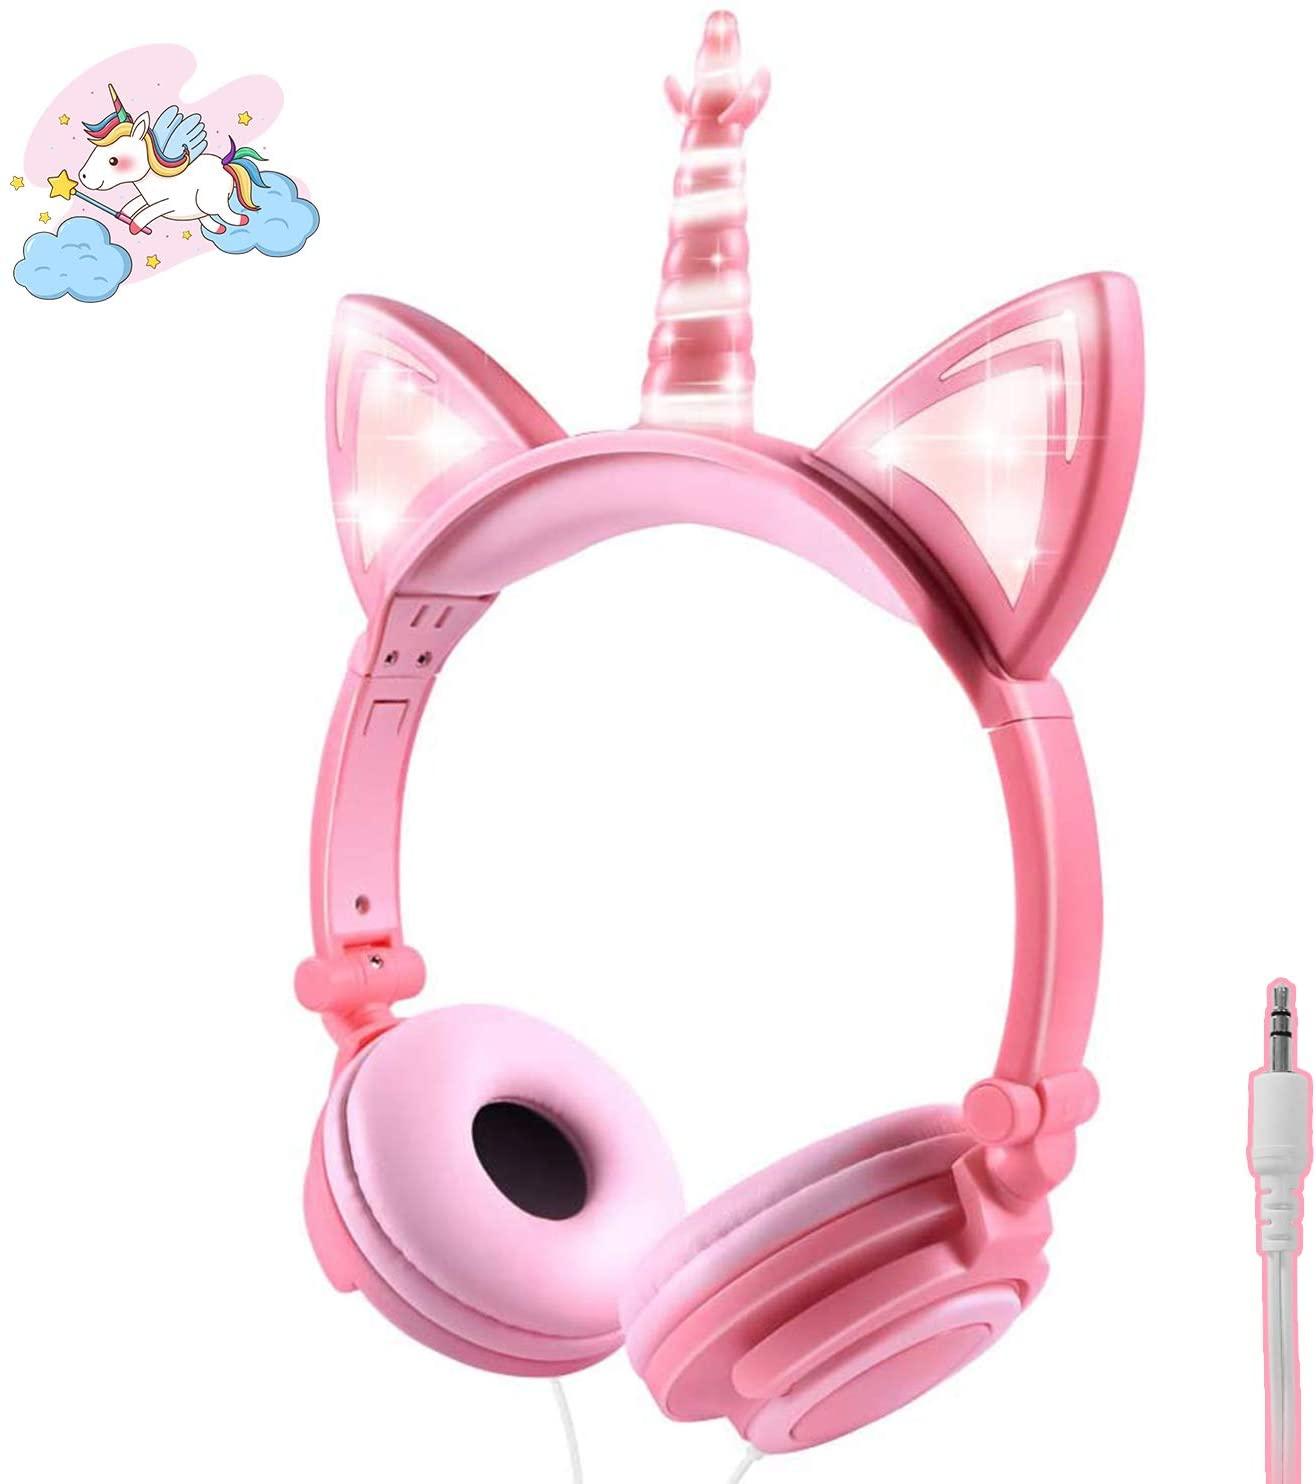 ONTA Kids Headphones,Unicorn Cat Ear Headphone LED Light Up Earphone Foldable Wired On-Ear Toddlers for Travel,Children/Boys/Girls Birthday Gifts,Superior Noise Isolation Ultra-Portable Design(Peach)